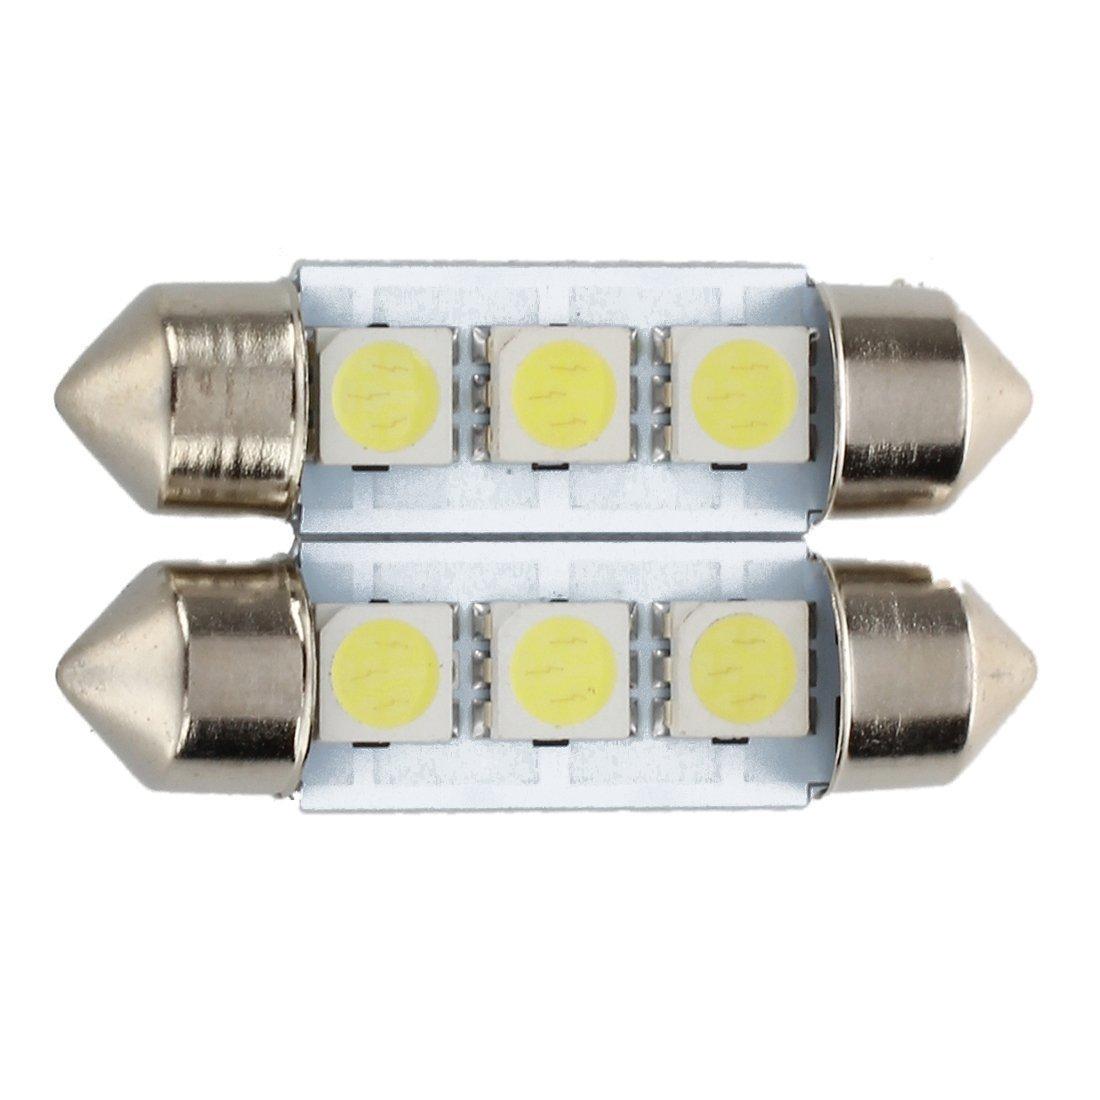 TOOGOO(R) 2x C5W 3 LED SMD 5050 34mm Plaque Xenon Blanc Ampoule navette Festons dome plafonnier voiture lumiere 4333231567